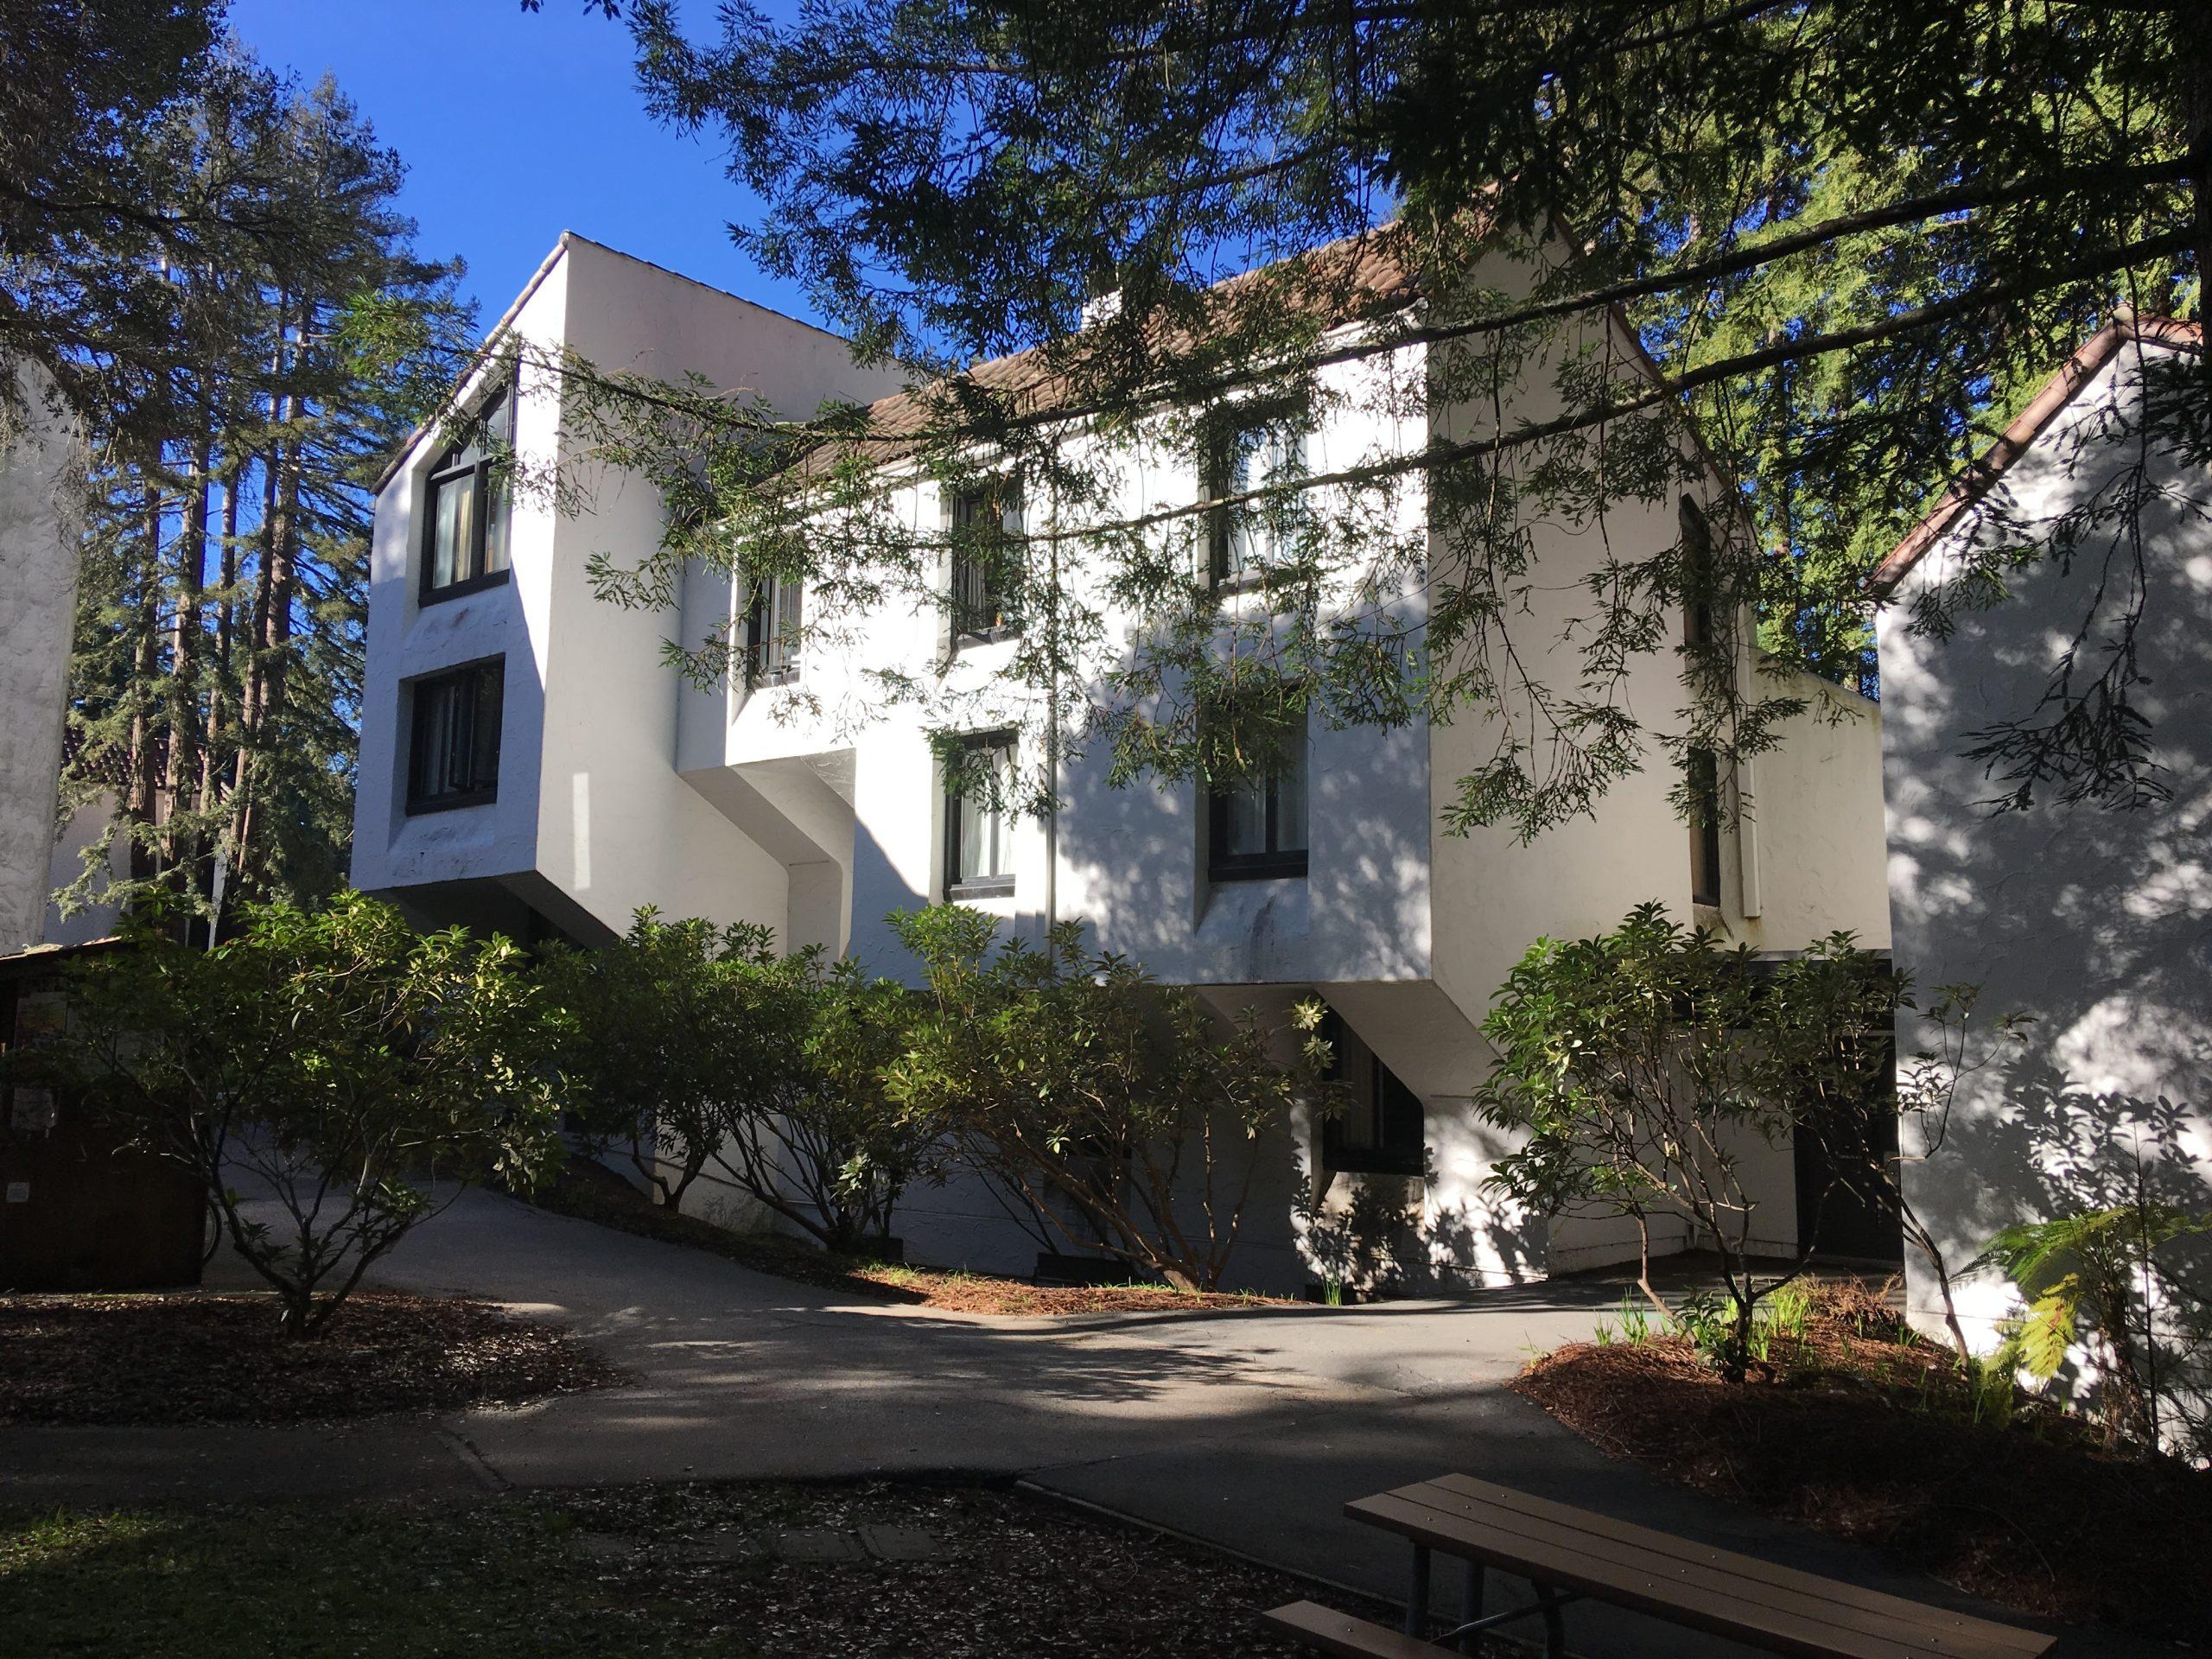 University of California, Santa Cruz's Crown College Residence Hall